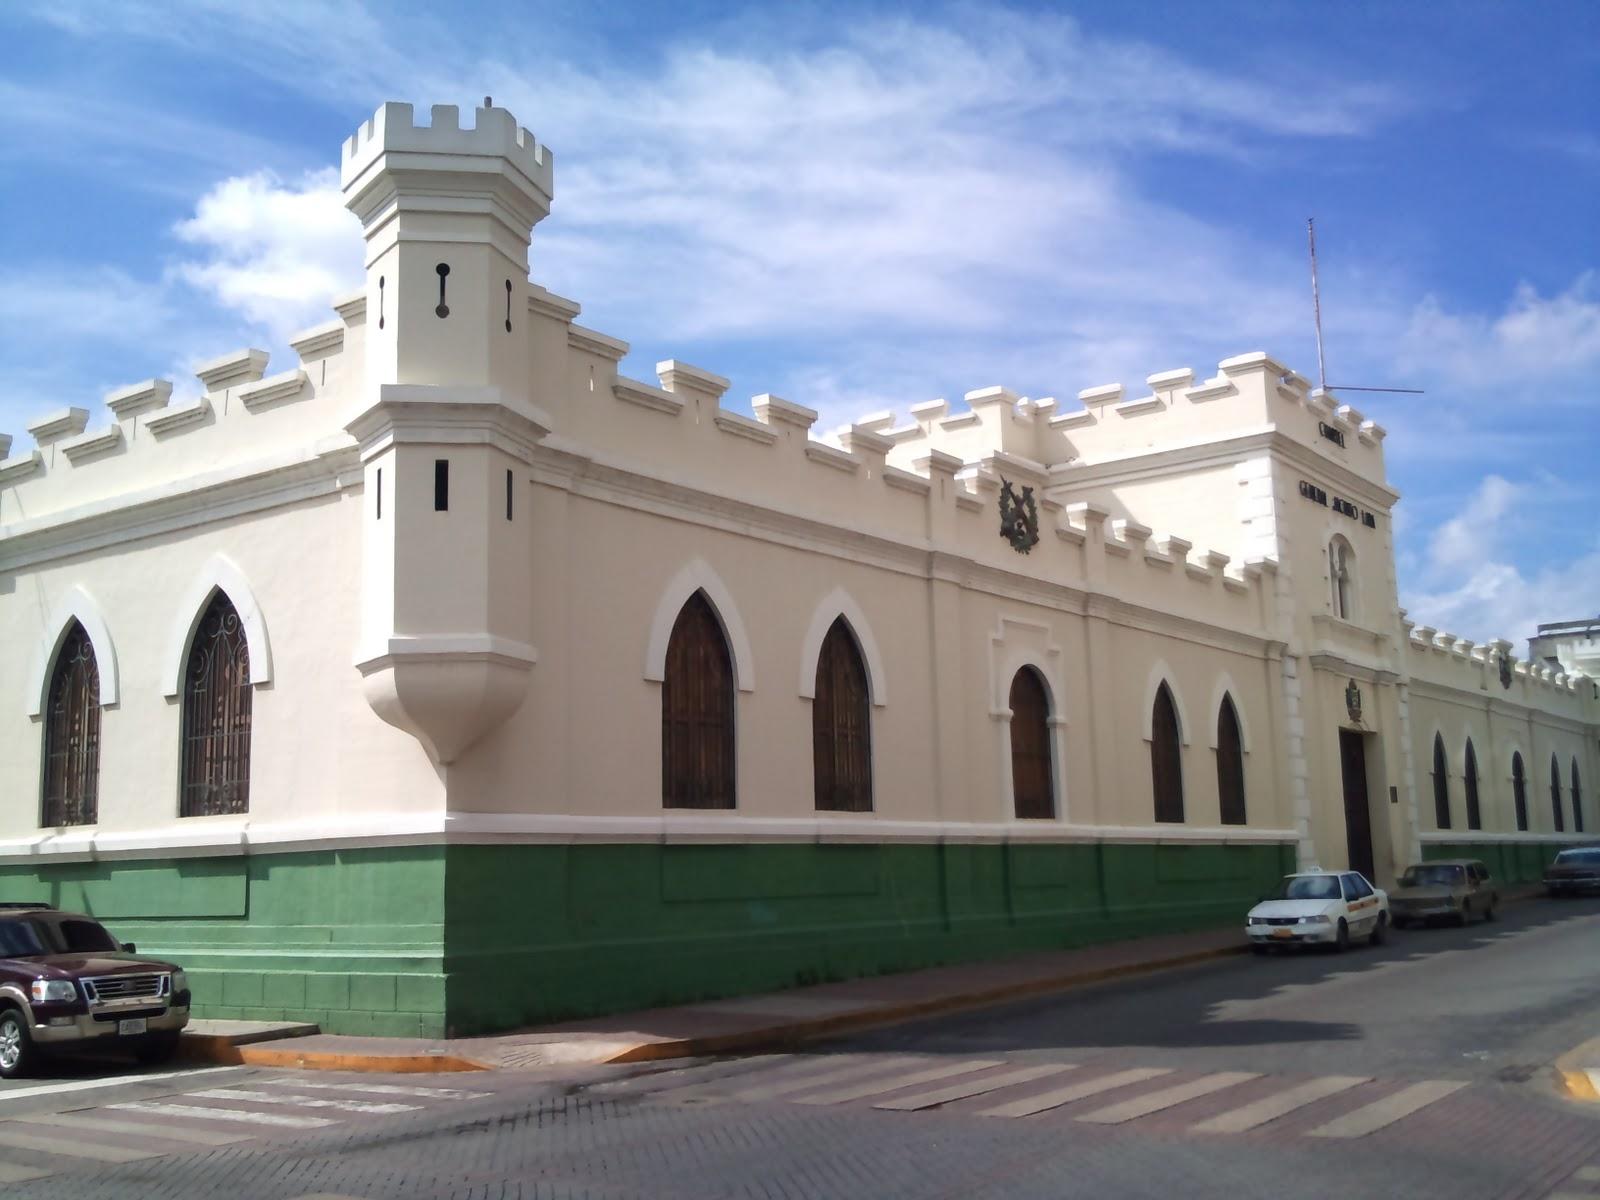 Cultura larense cuartel jacinto lara arquitectura militar for Arquitectura militar